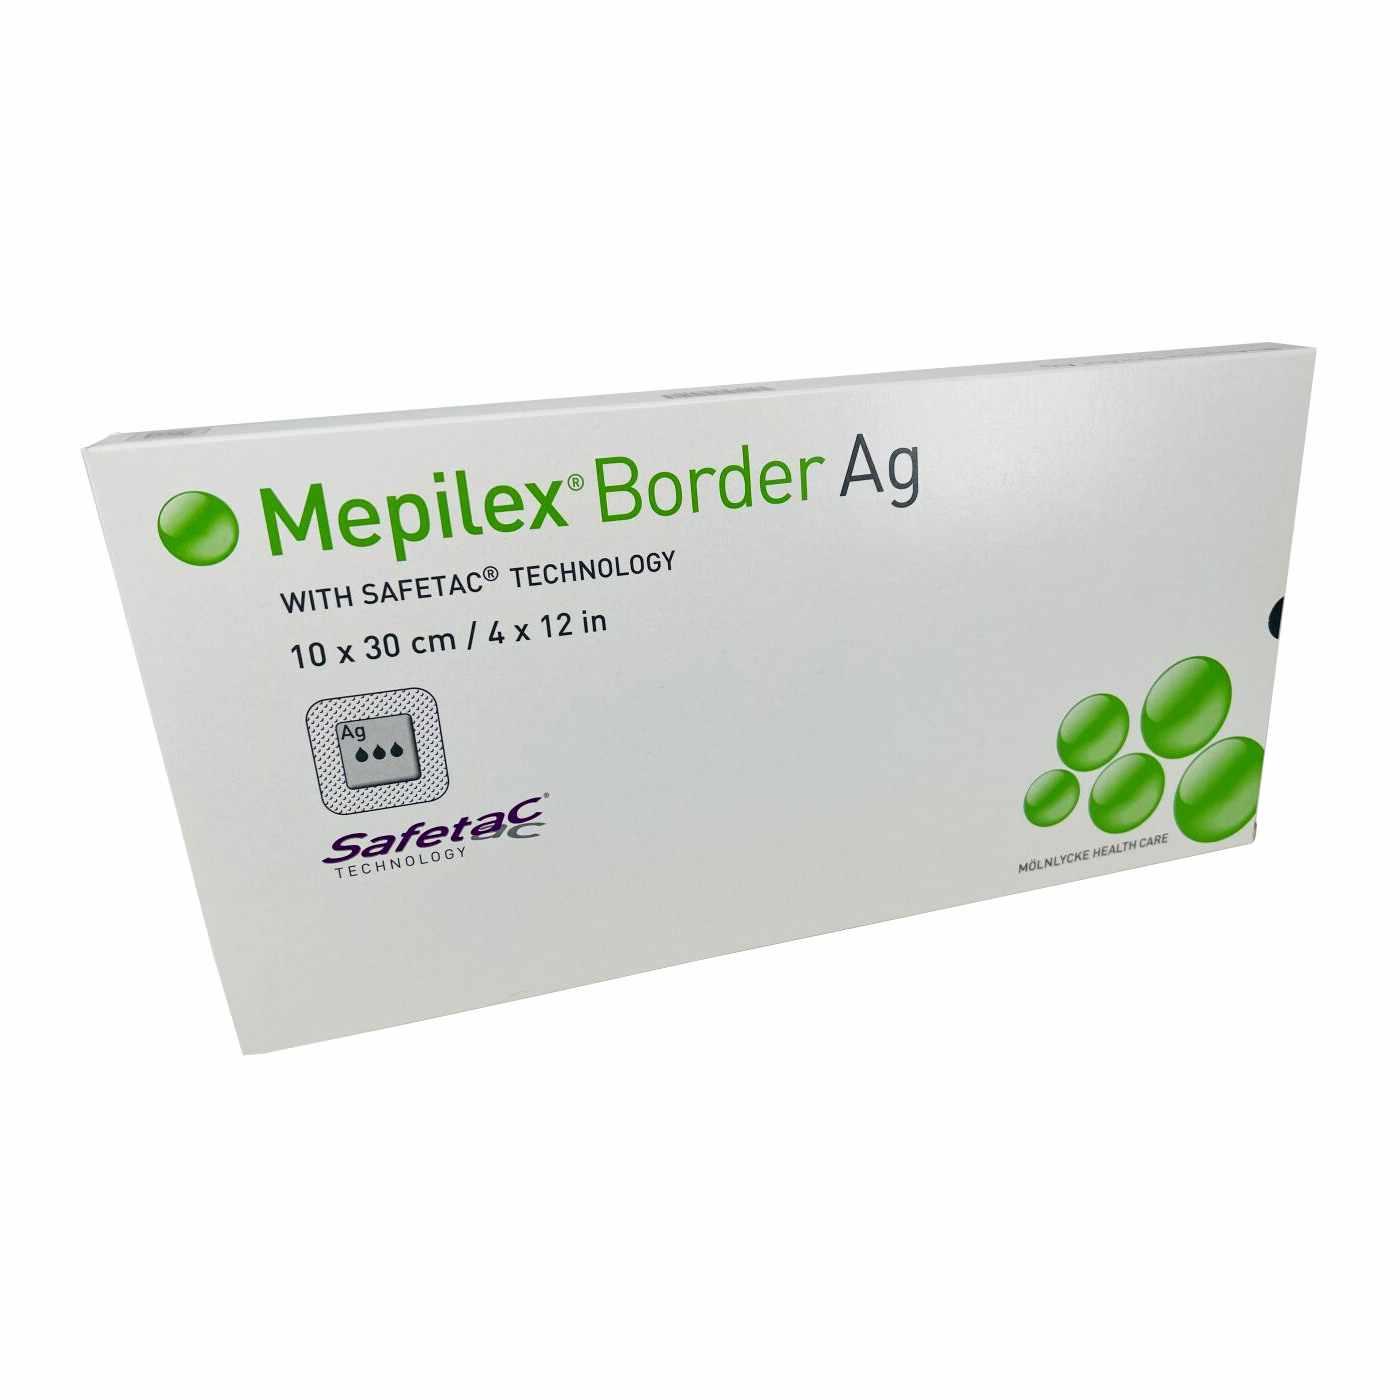 "Molnlycke mepilex border Ag post-op antimicrobial foam dressing with silver 4"" x 12"""